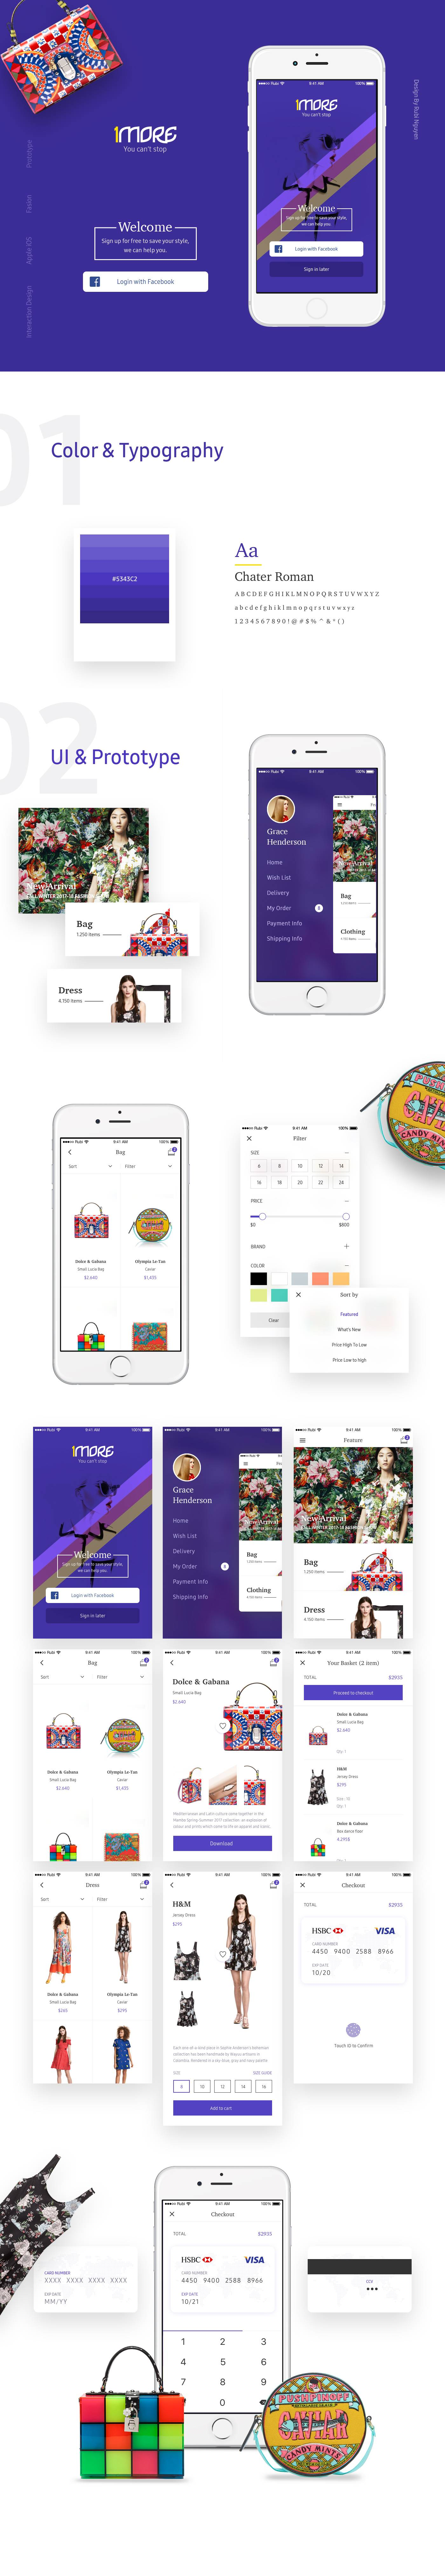 1more 电商购物APP UI界面设计 sketch素材下载